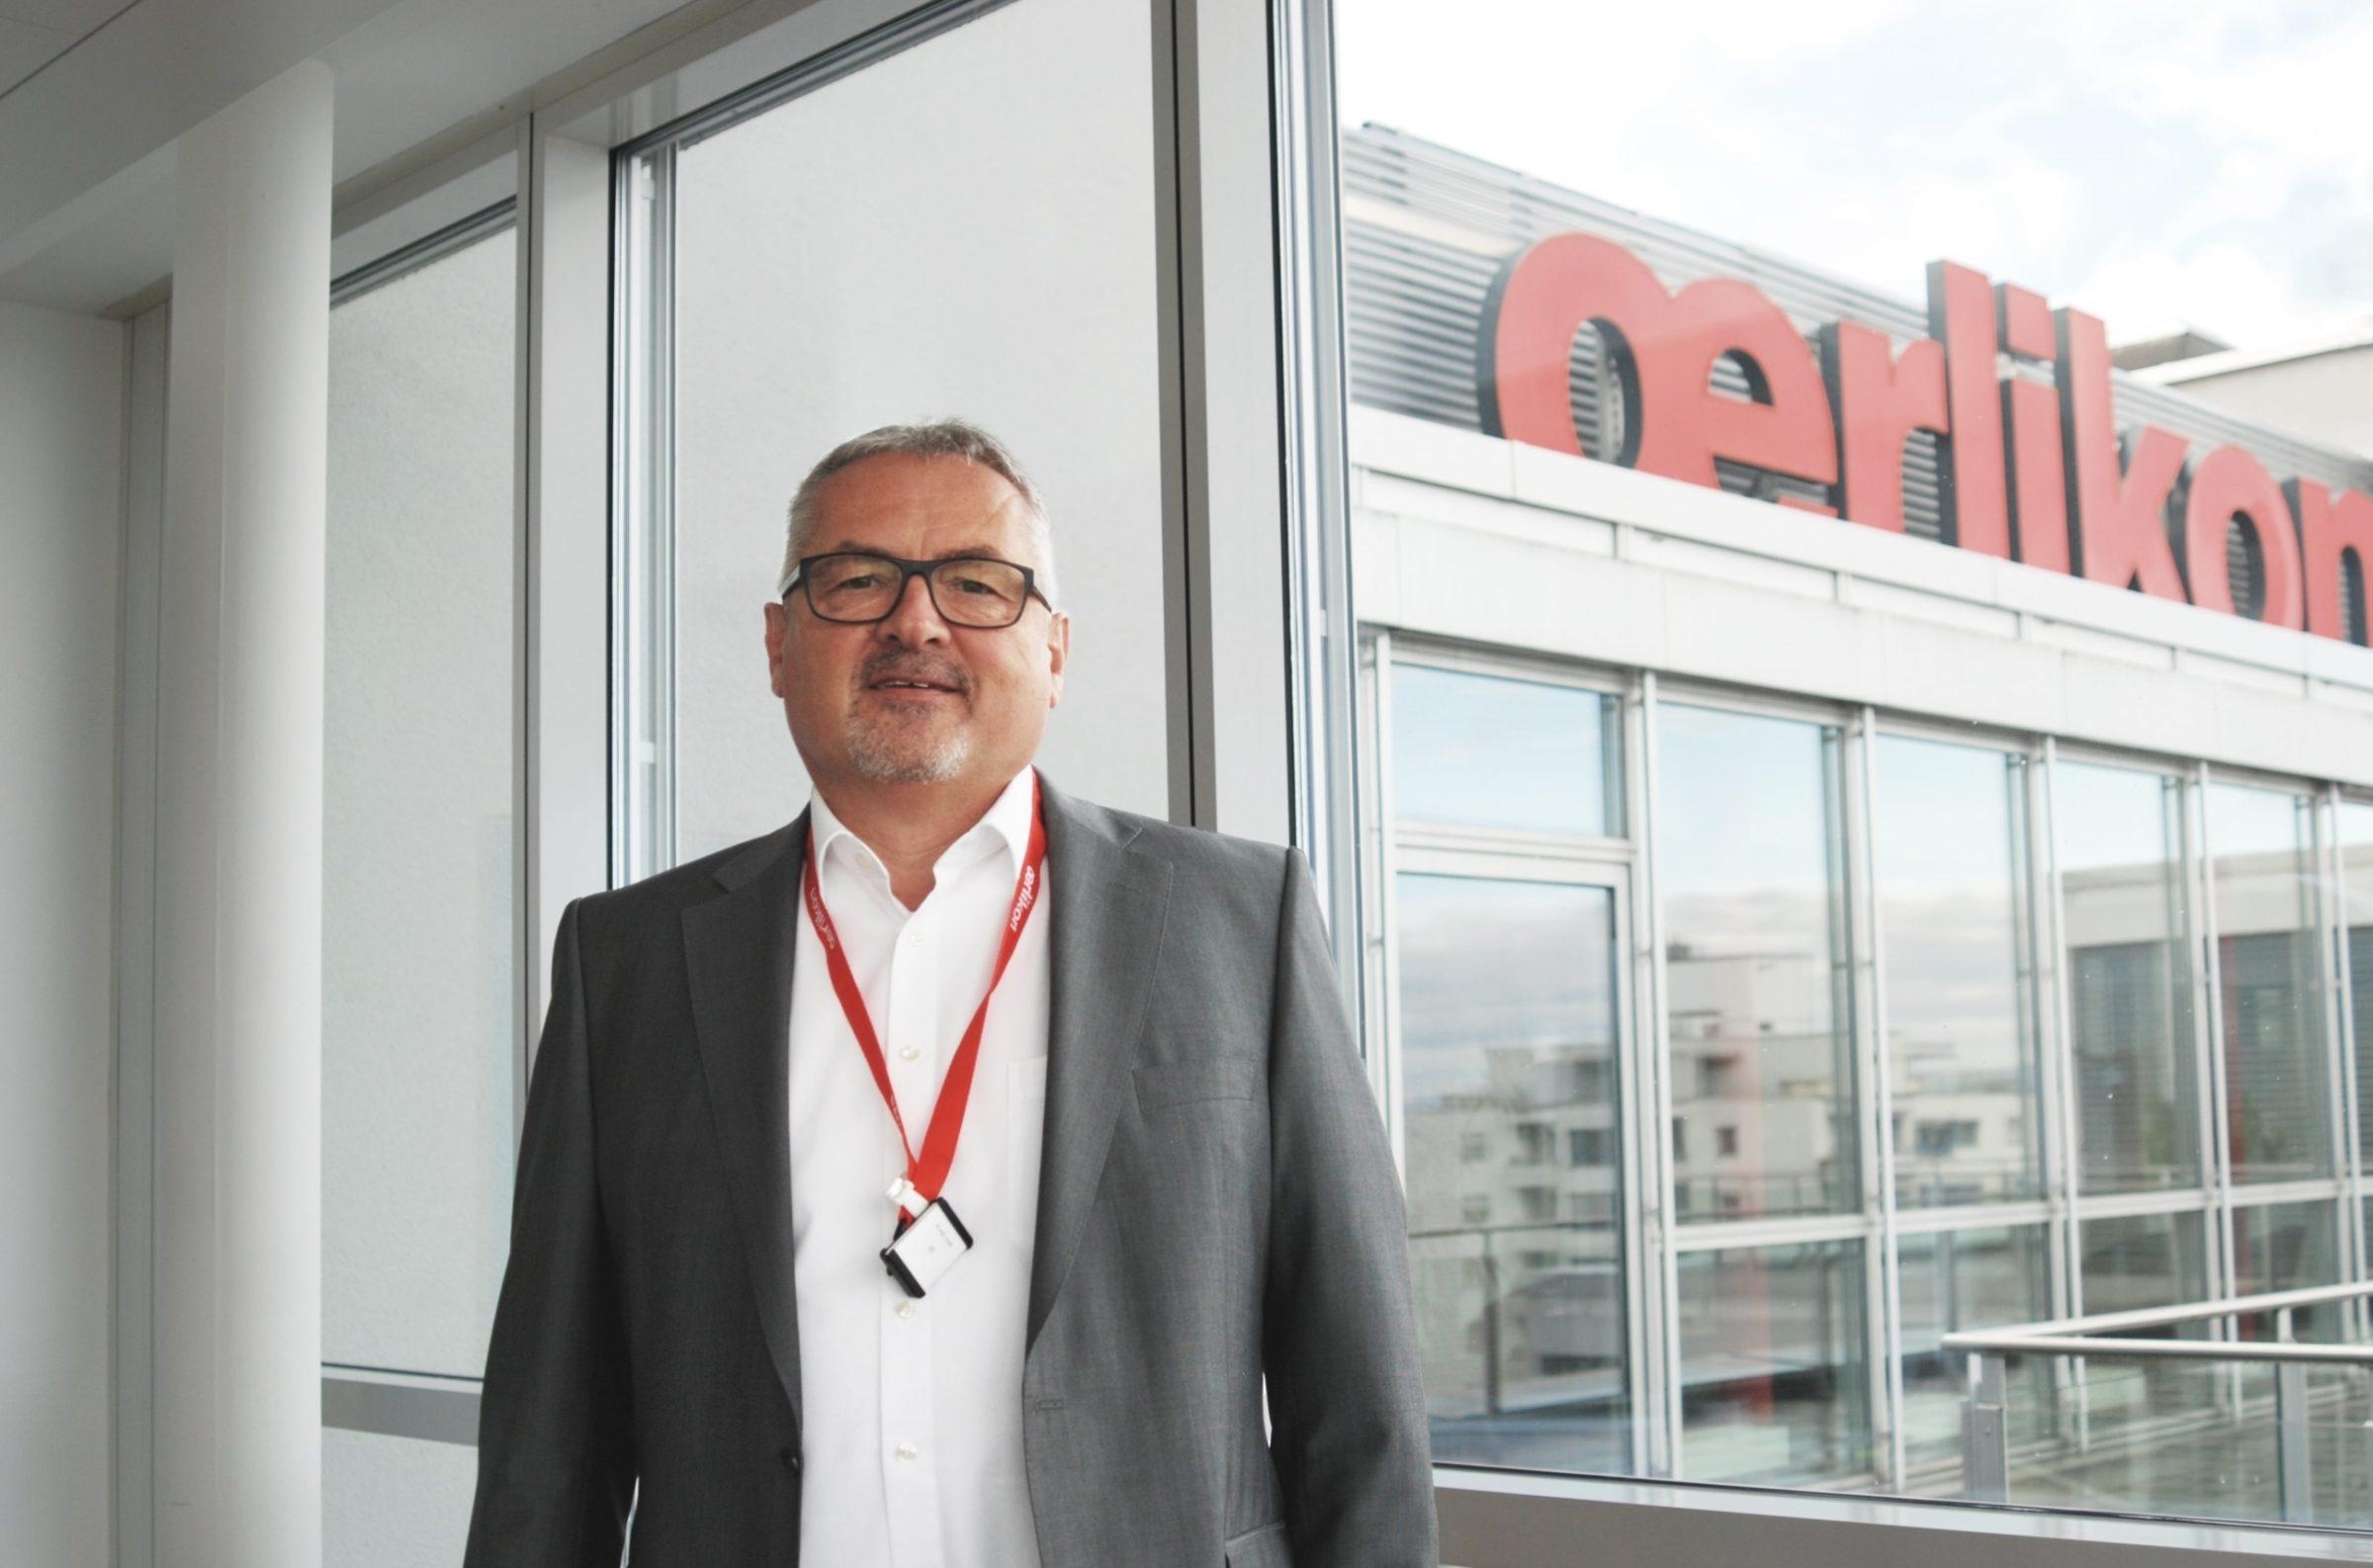 Image2 KINEXON Safe Tag Oerlikon CEO